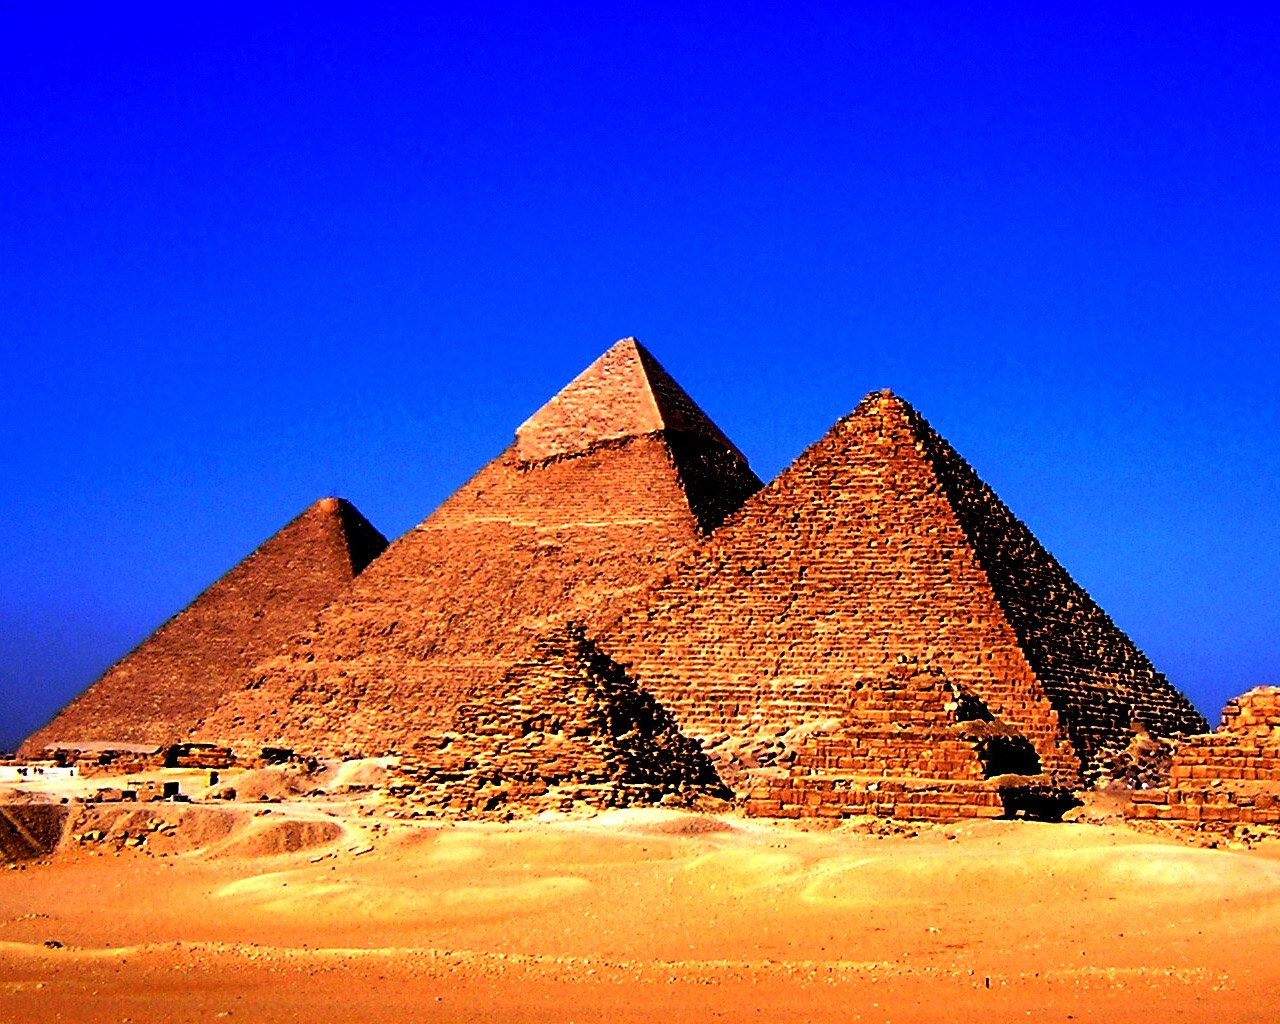 Hd Wallpapers Egypt Pyramids Wallpaper Desktop Background In X Hd 768 1280x1024